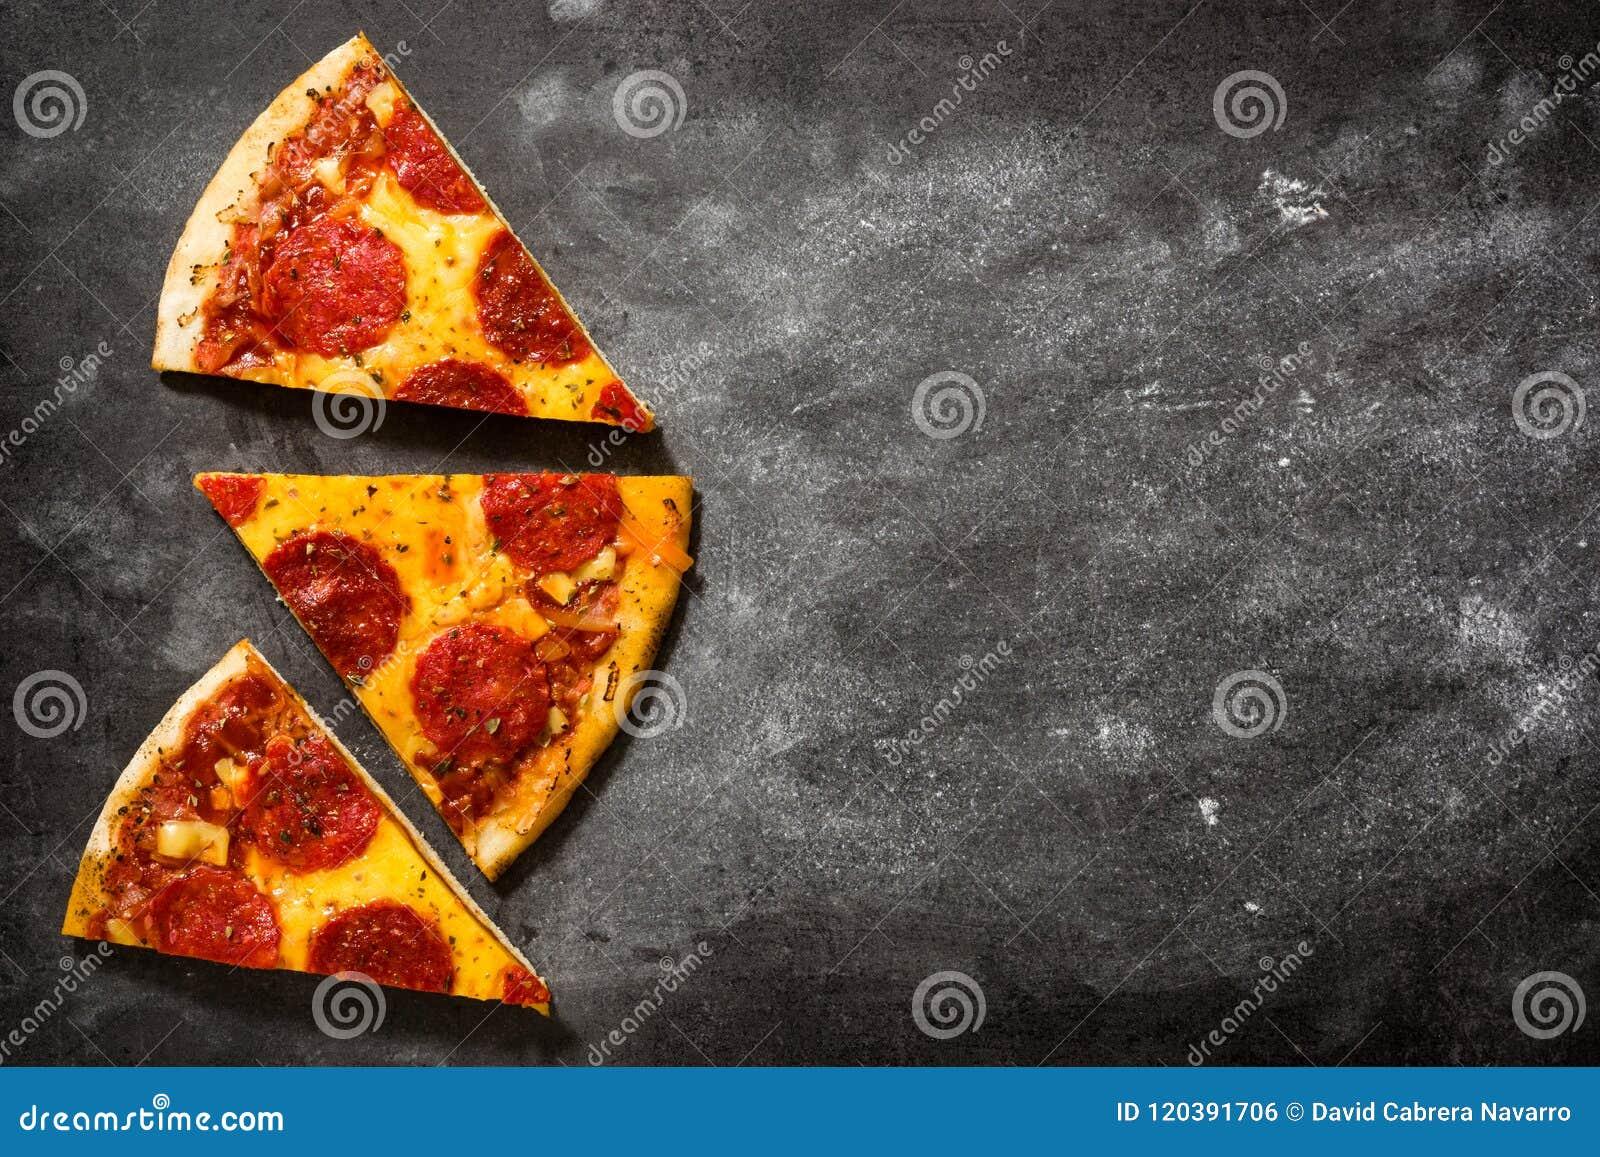 Hot italian pepperoni pizza slice on black stone.